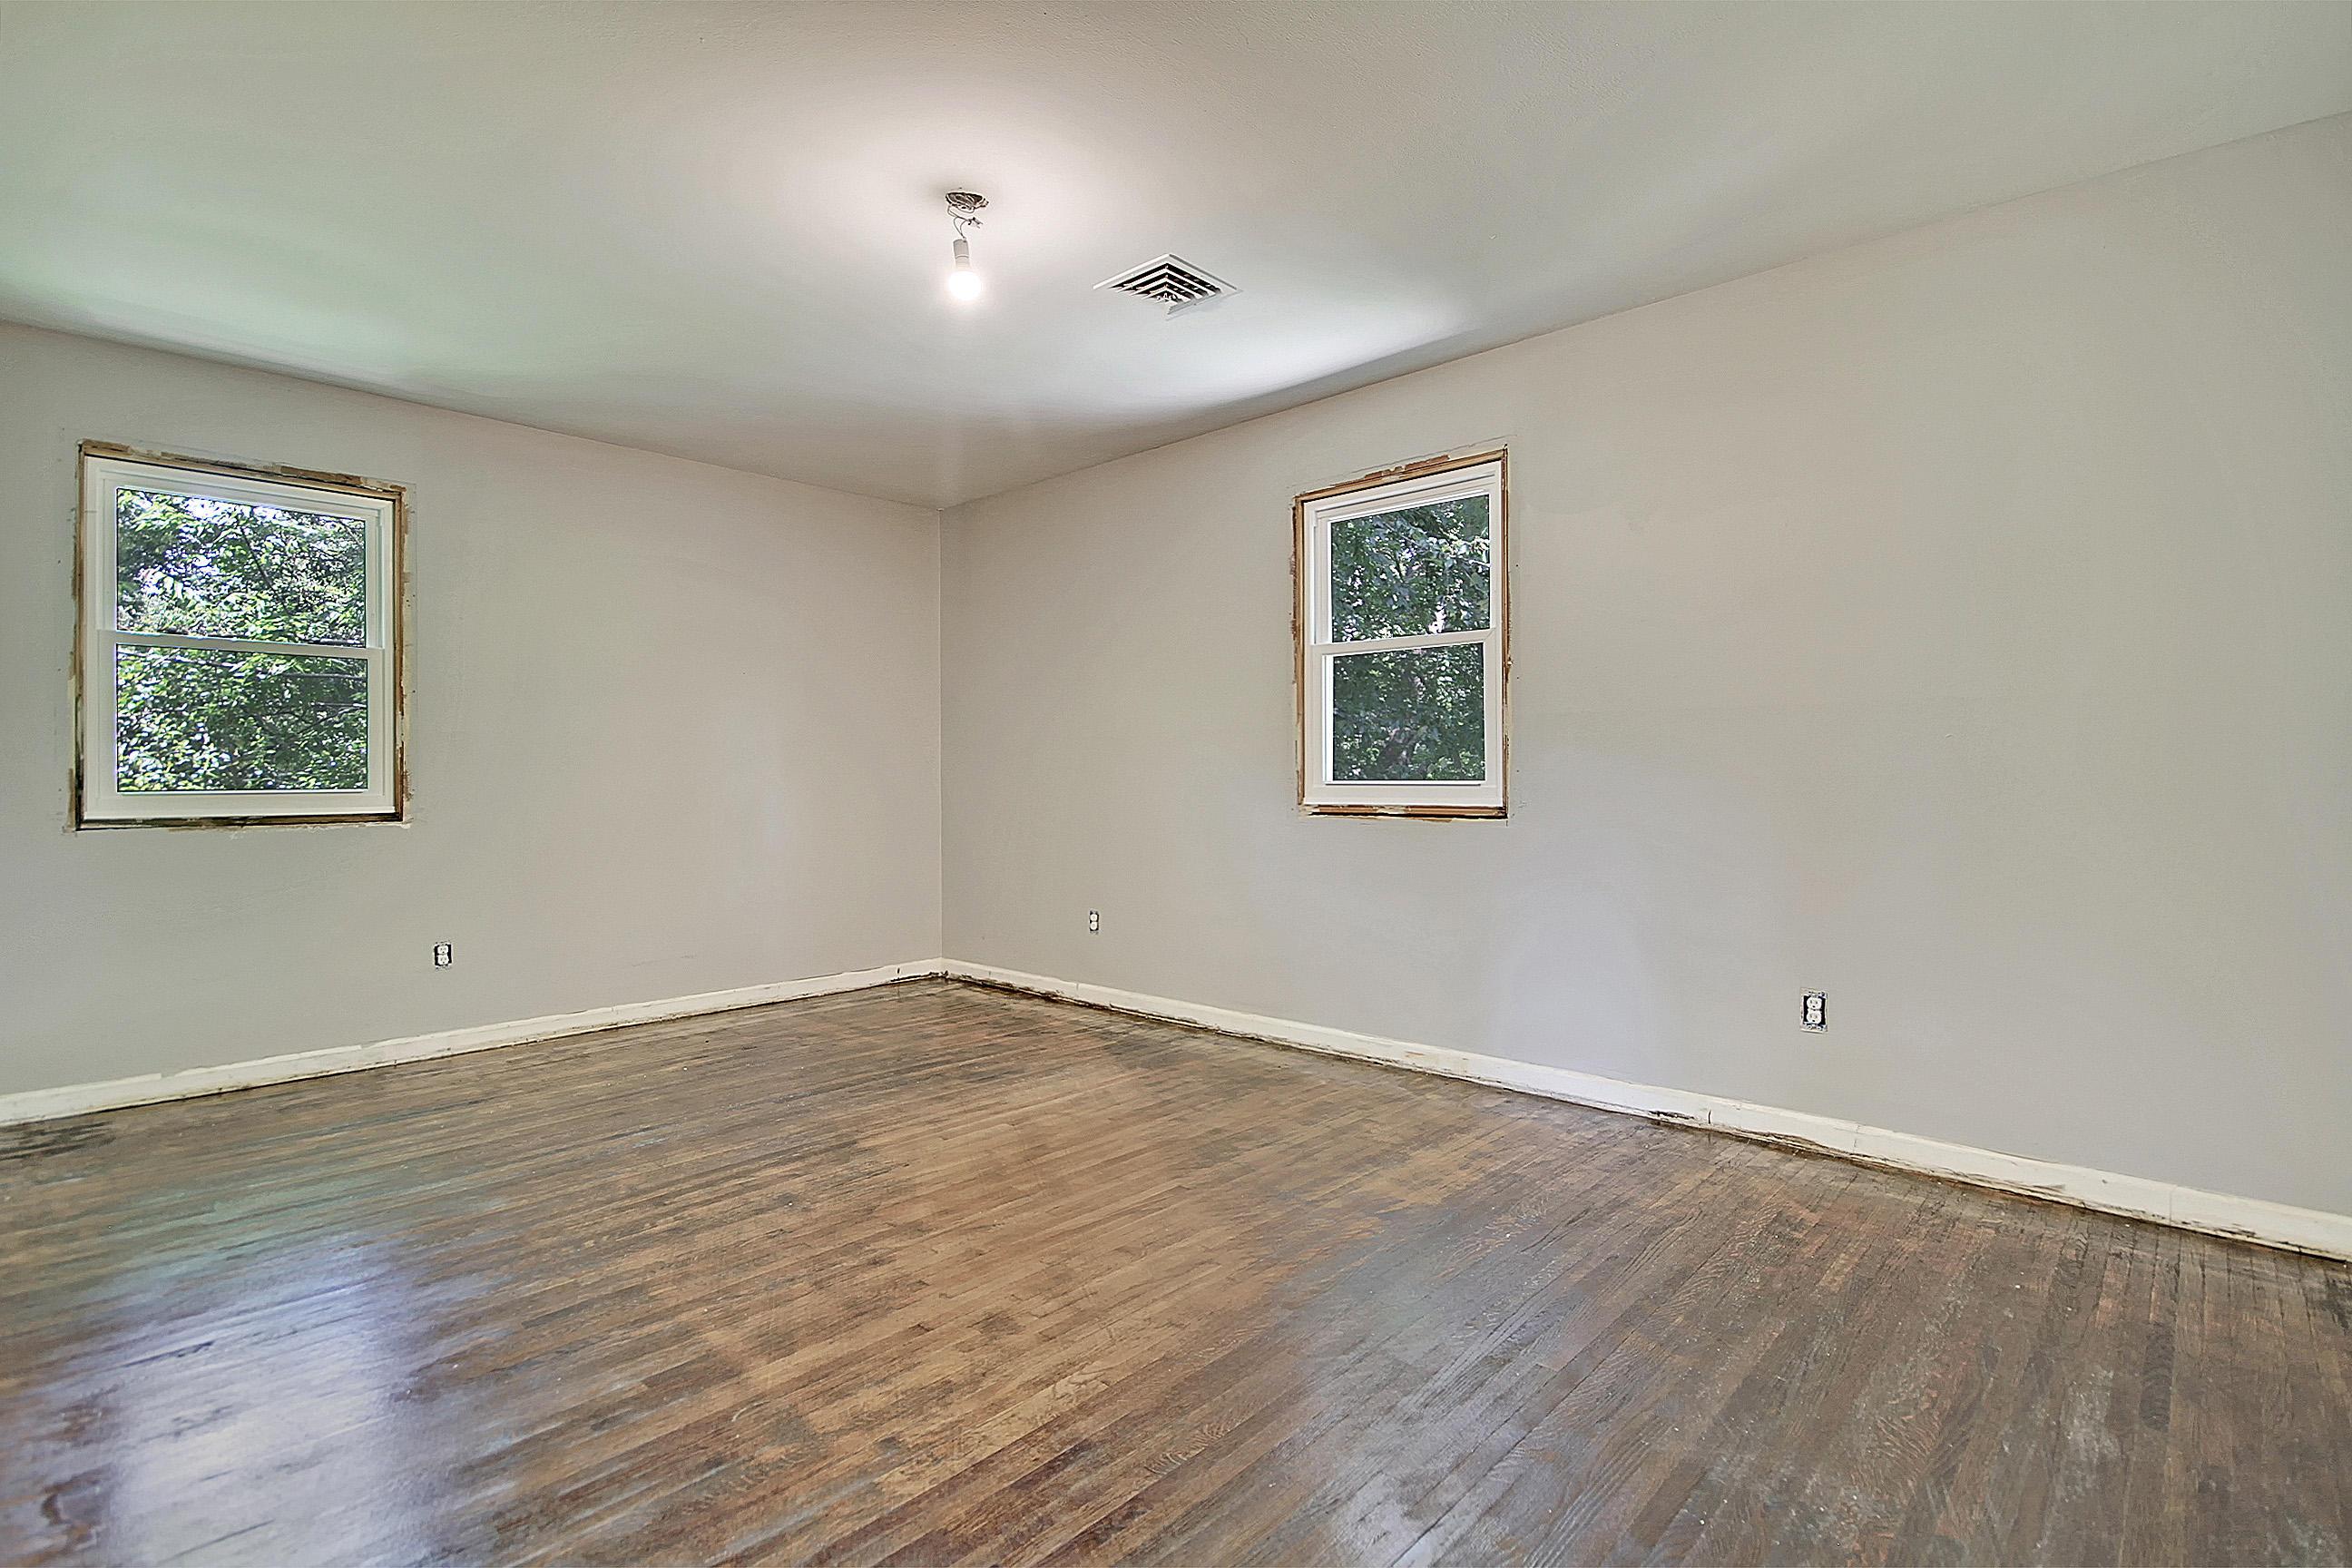 Northbridge Terrace Homes For Sale - 1094 Northbridge, Charleston, SC - 20